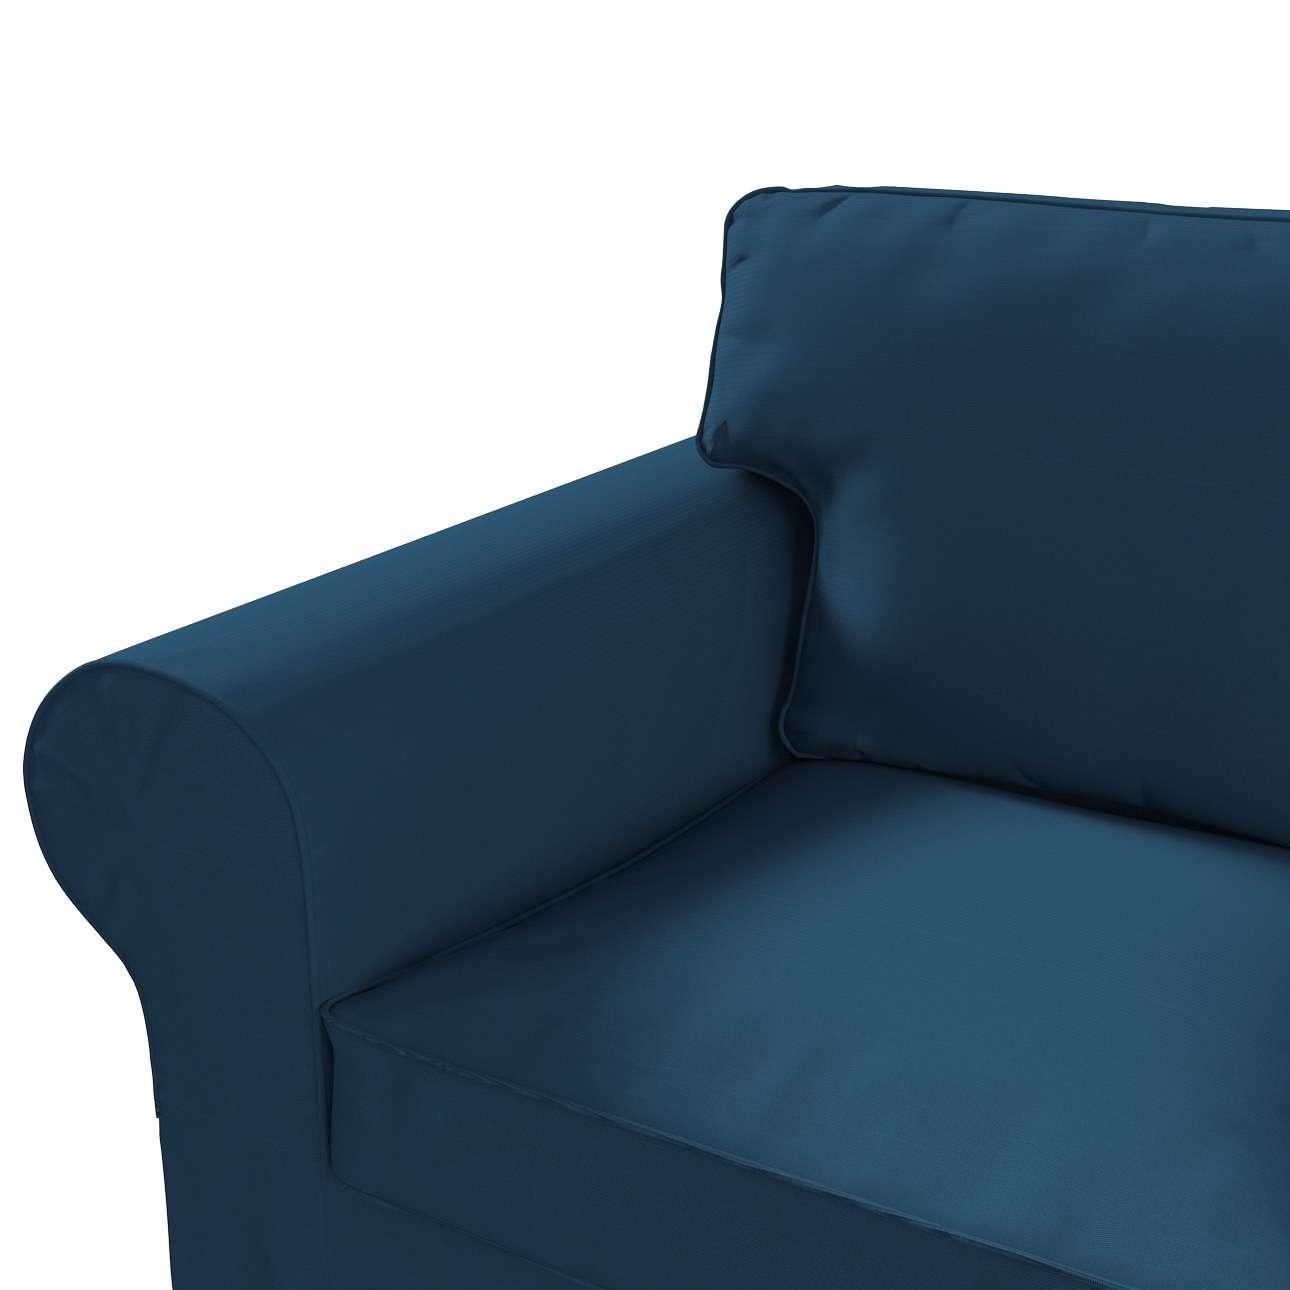 Ektorp 3-Sitzer Sofabezug nicht ausklappbar Sofabezug für  Ektorp 3-Sitzer nicht ausklappbar von der Kollektion Cotton Panama, Stoff: 702-30